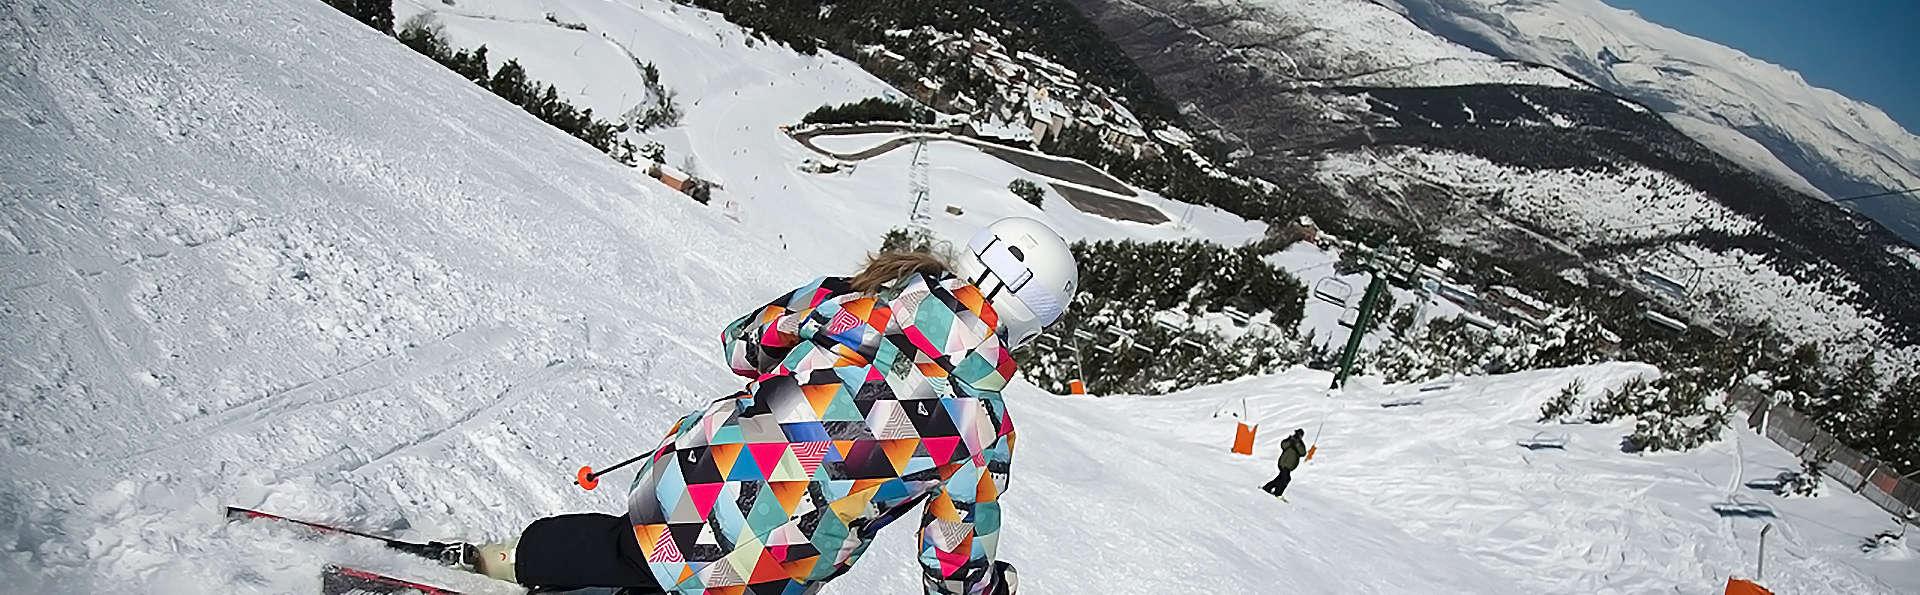 Escapade avec forfait de ski à La Molina